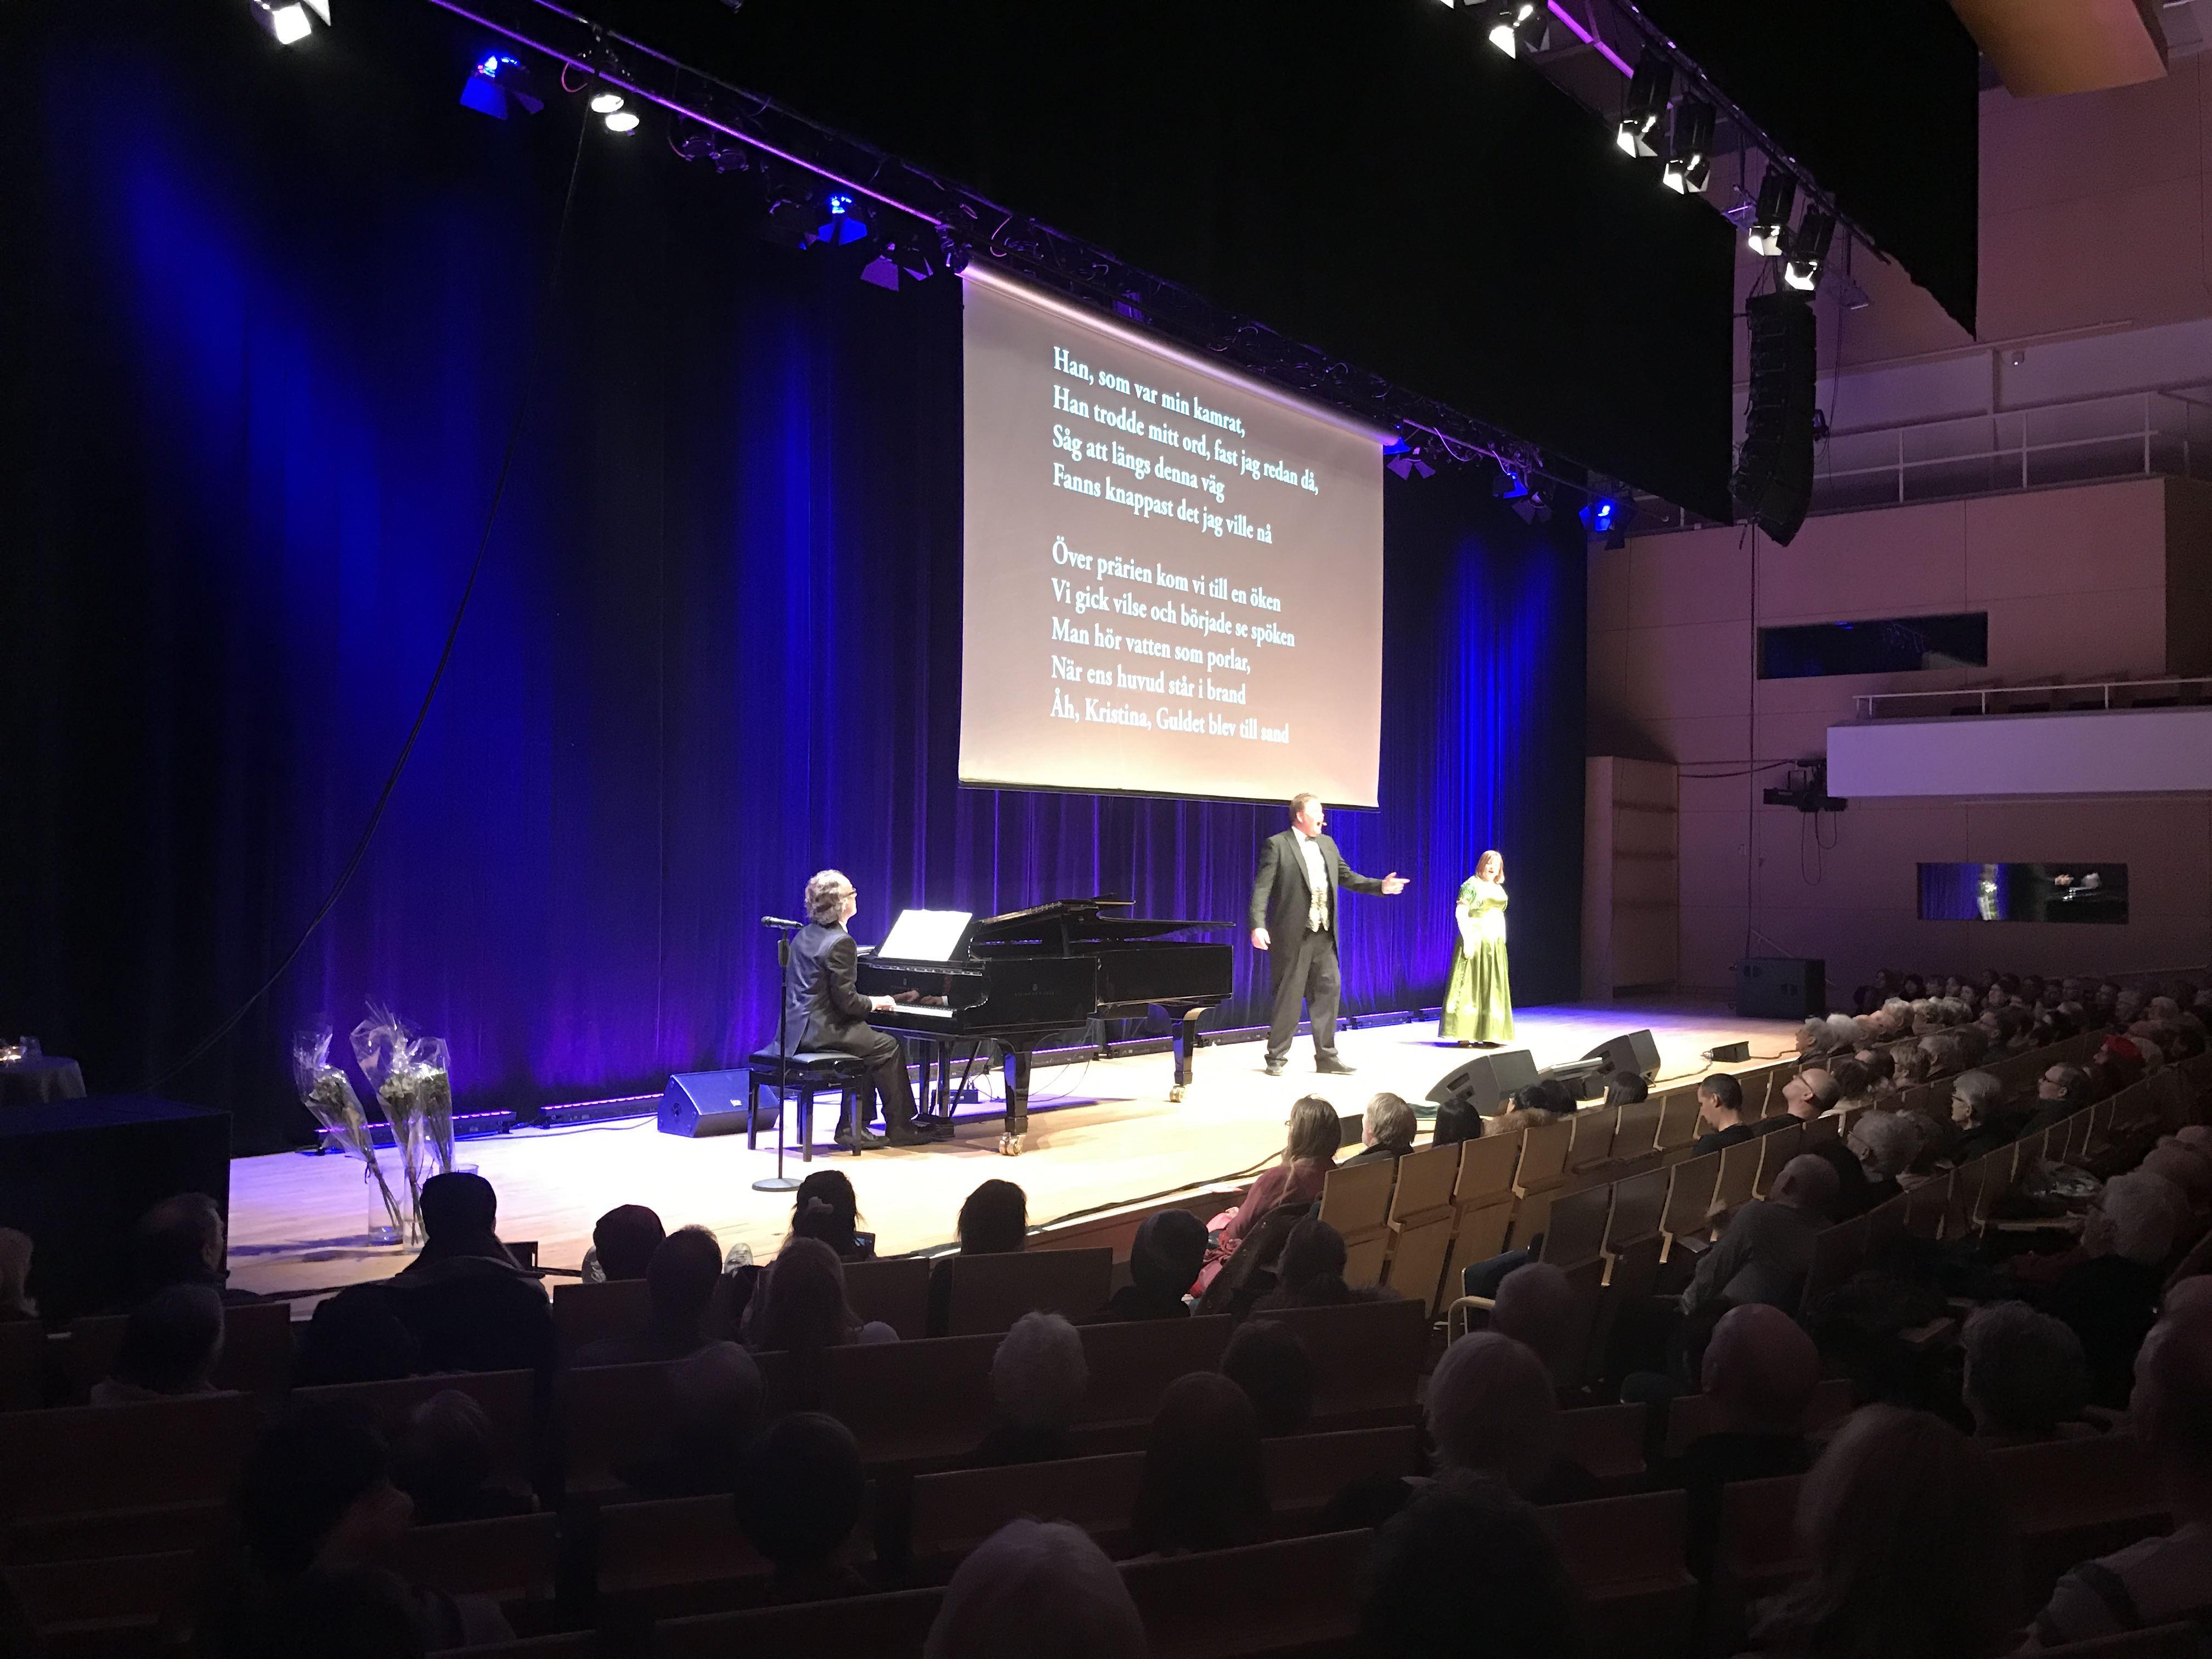 Musik: Opera sing-a-long